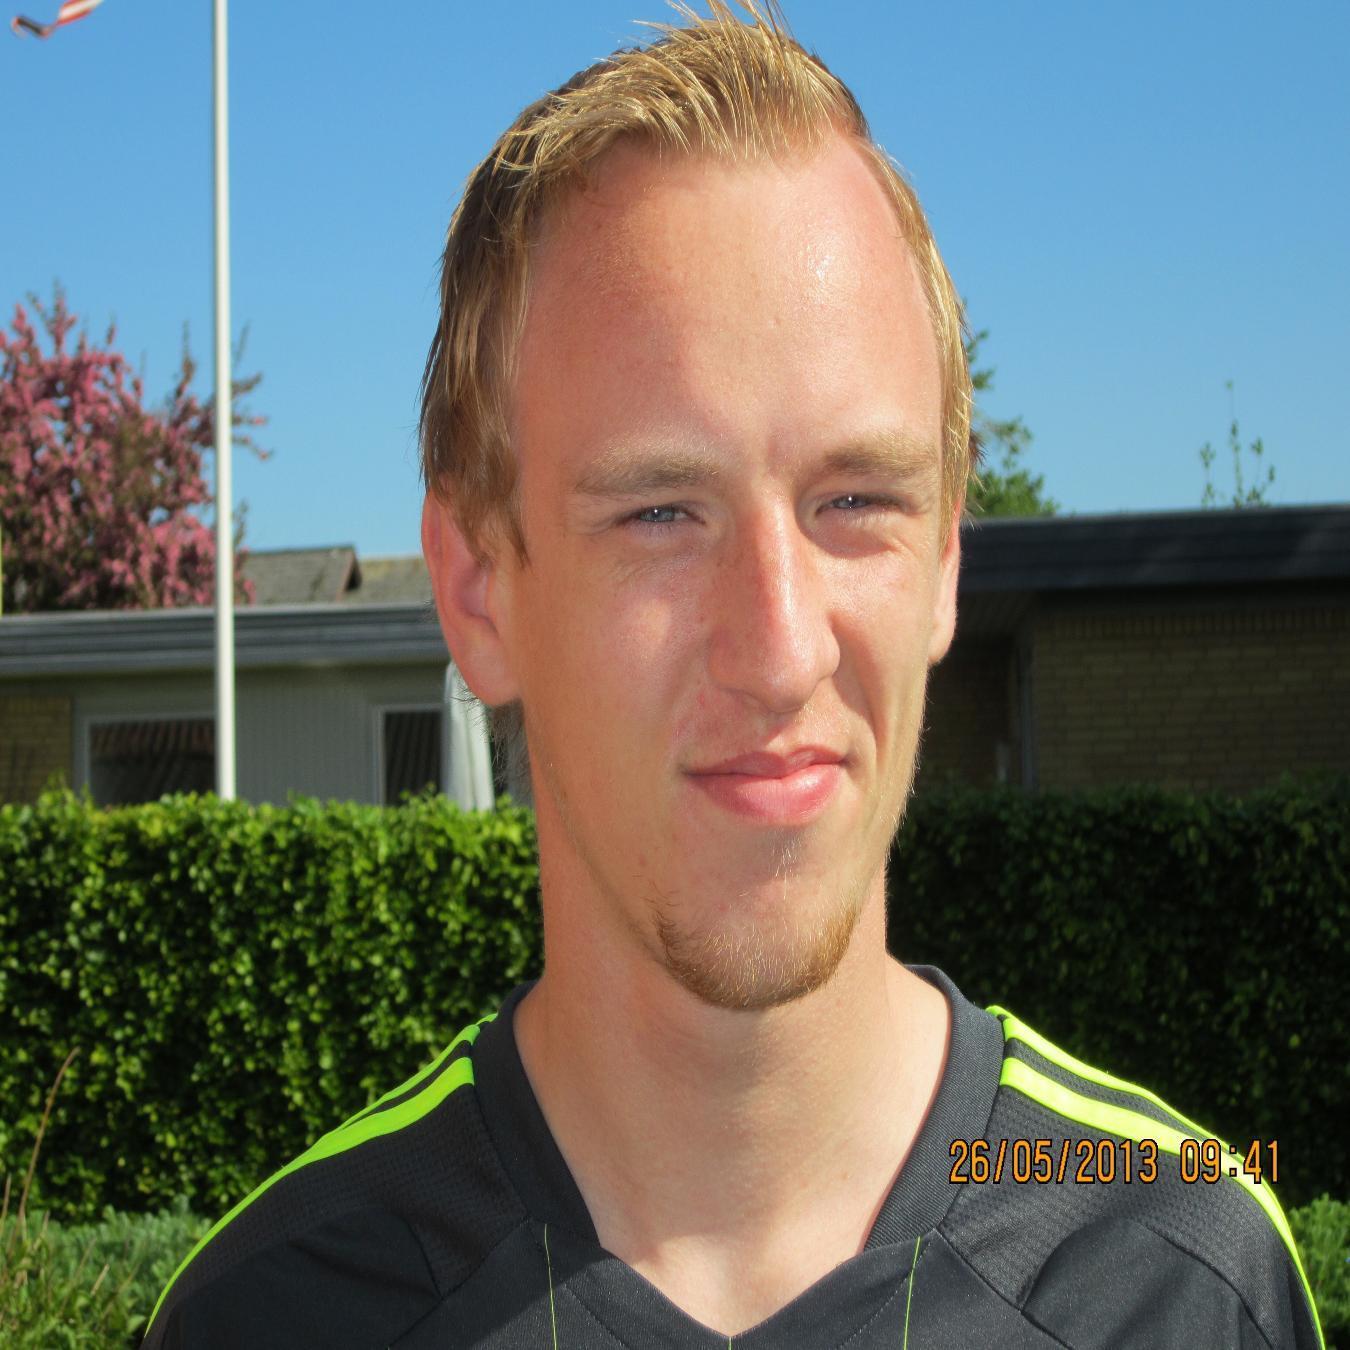 Nicolai Jensen